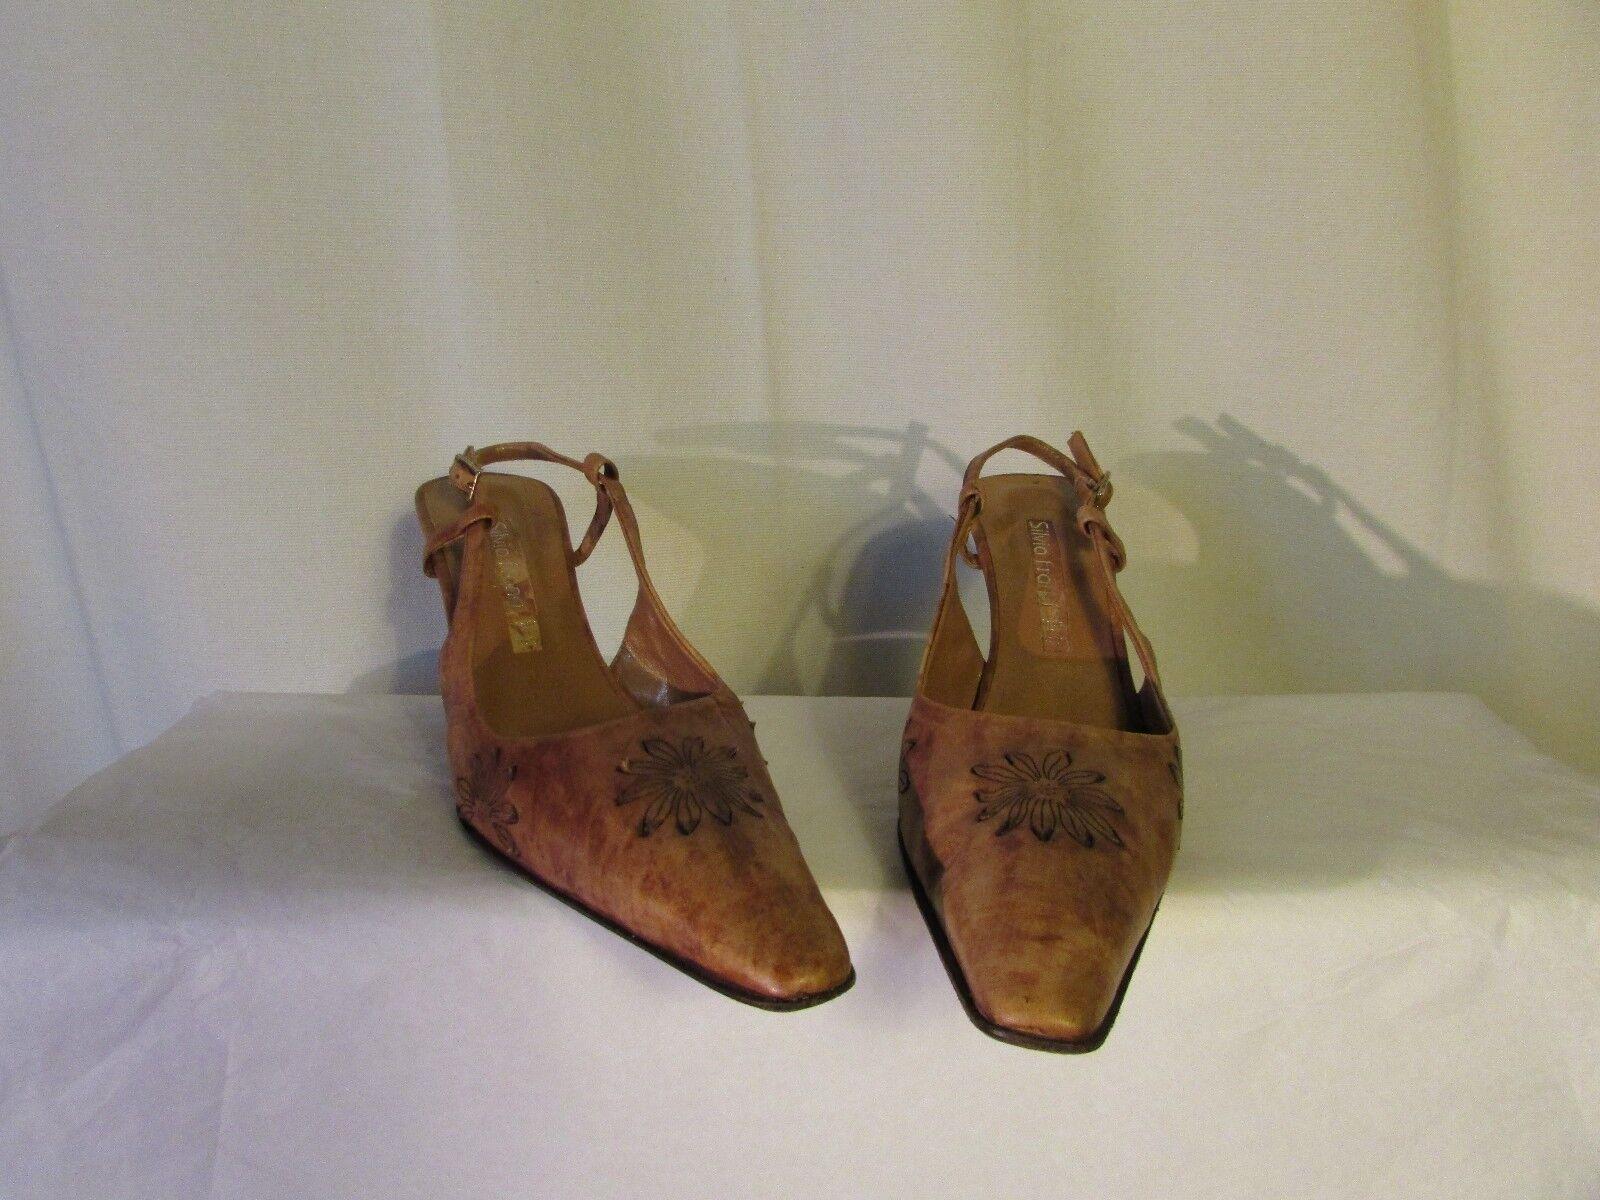 sandales compensées SILVIA FRANCI cuir caramel vieilli 39